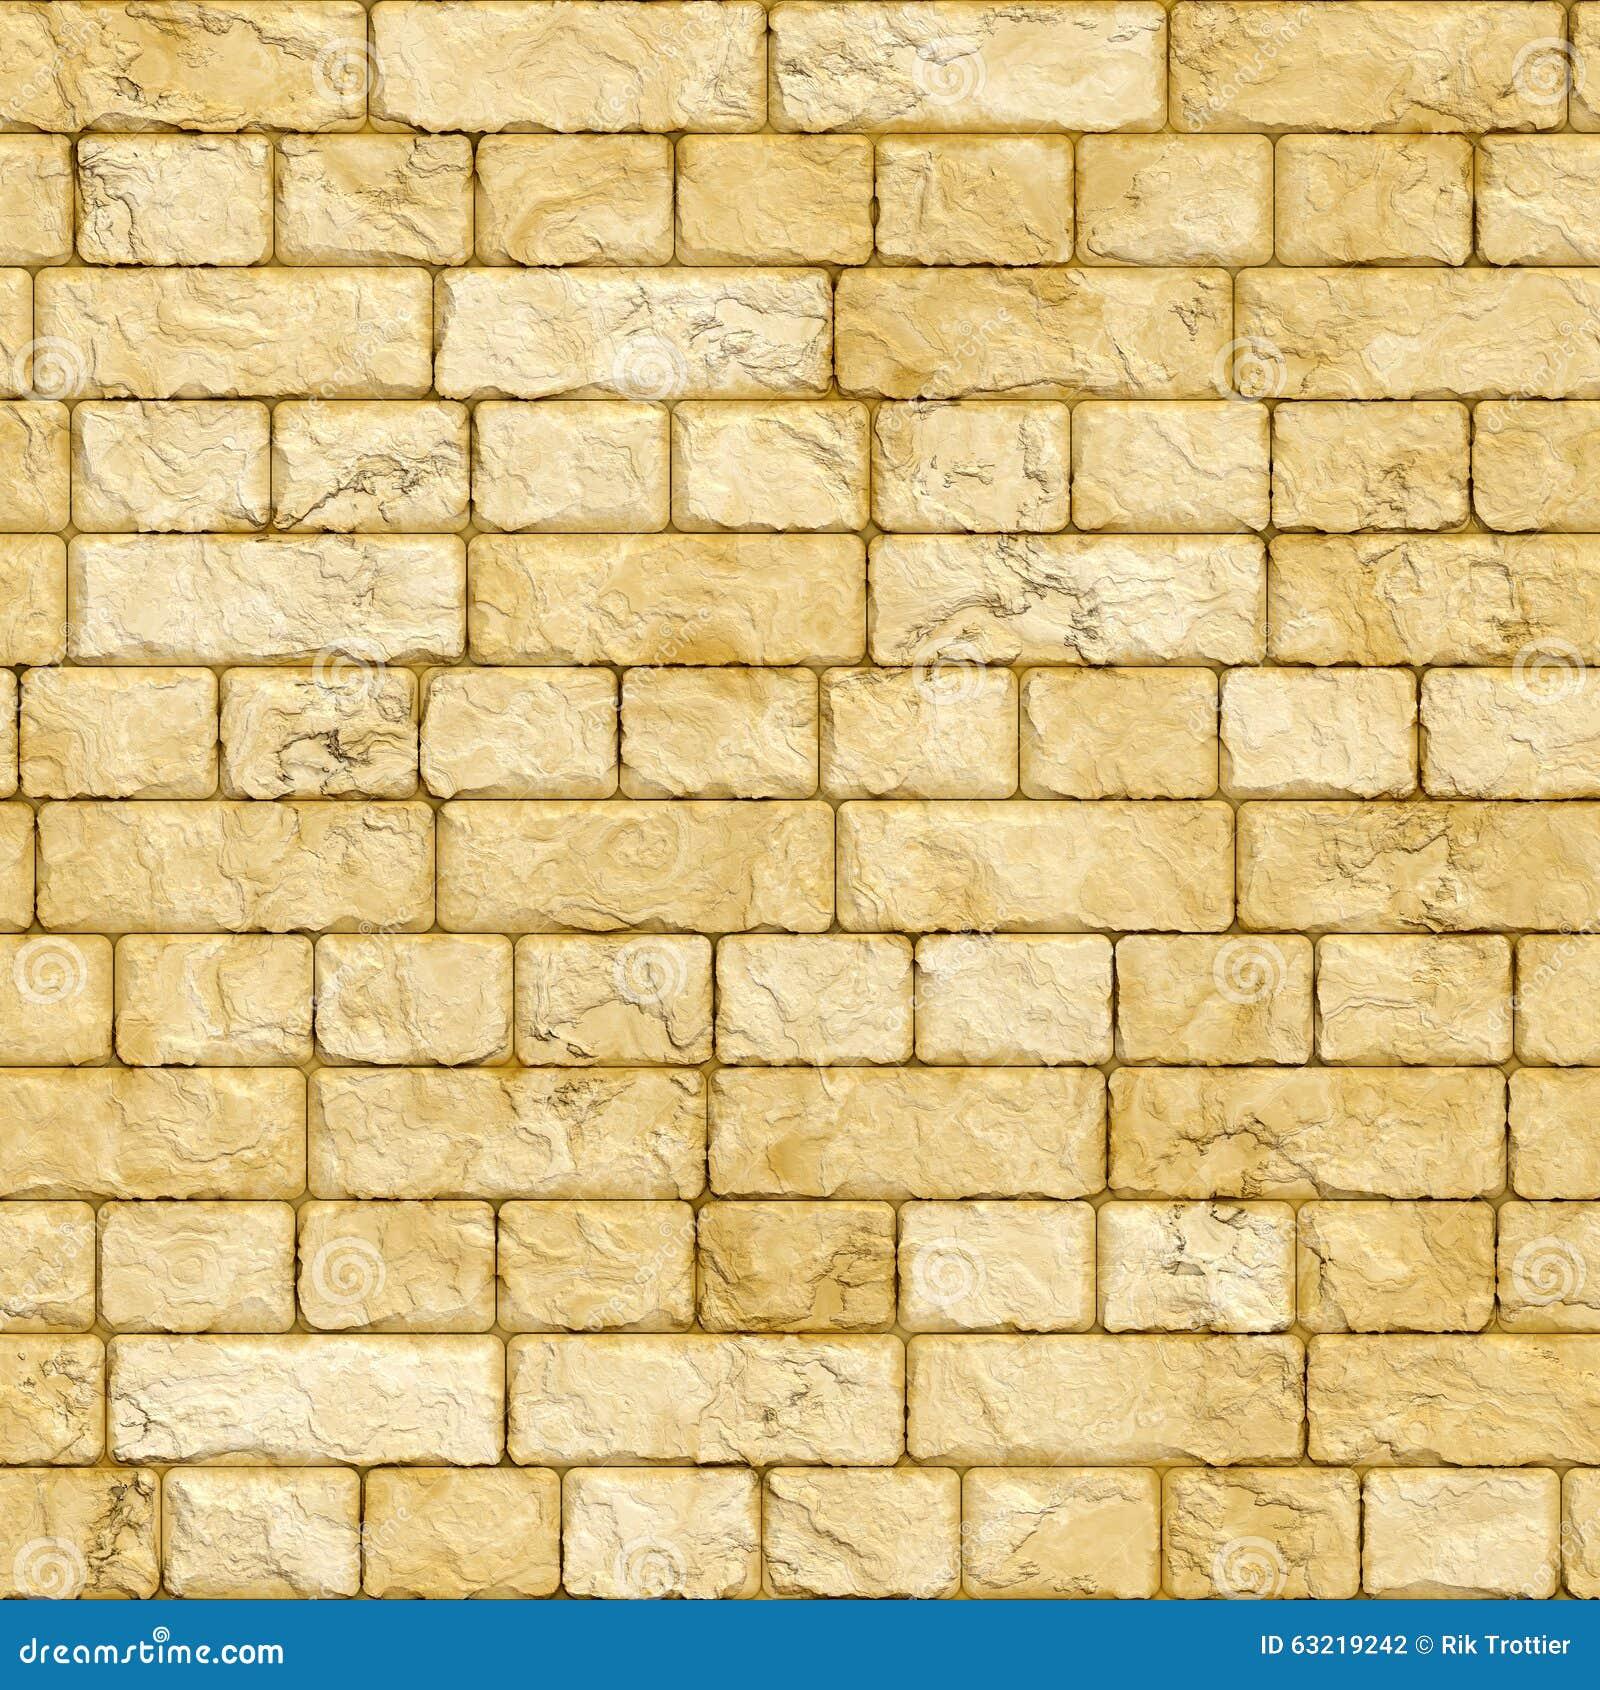 Sandstone brick wall stock illustration. Illustration of grains ...